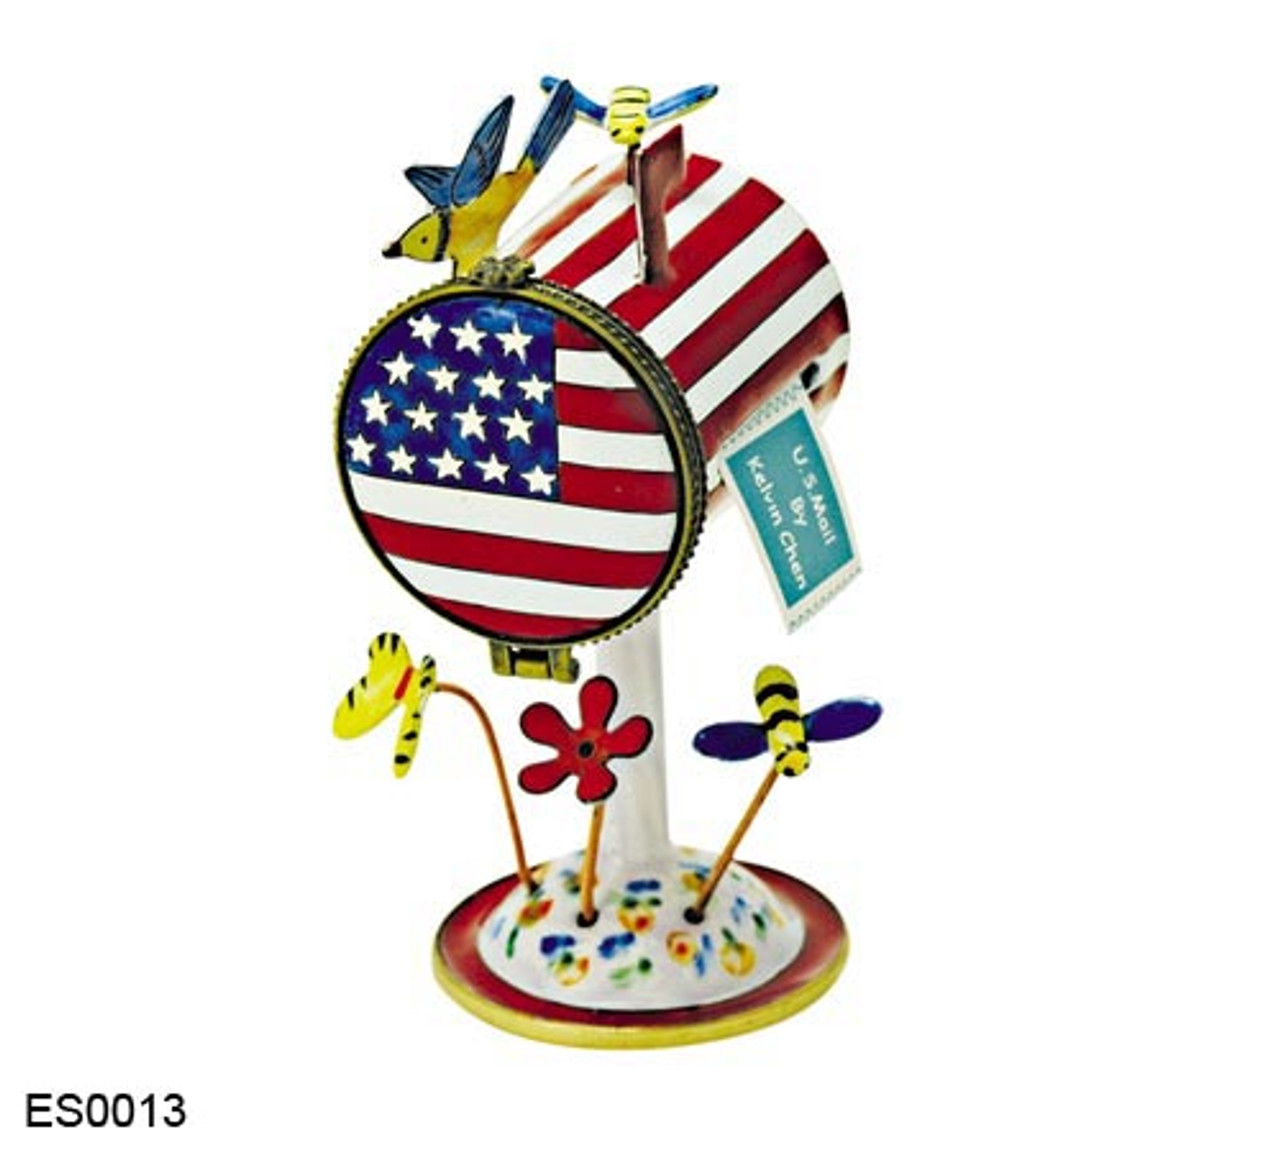 ES0013 Kelvin Chen American Flag Mailbox Hinged Stamp Box